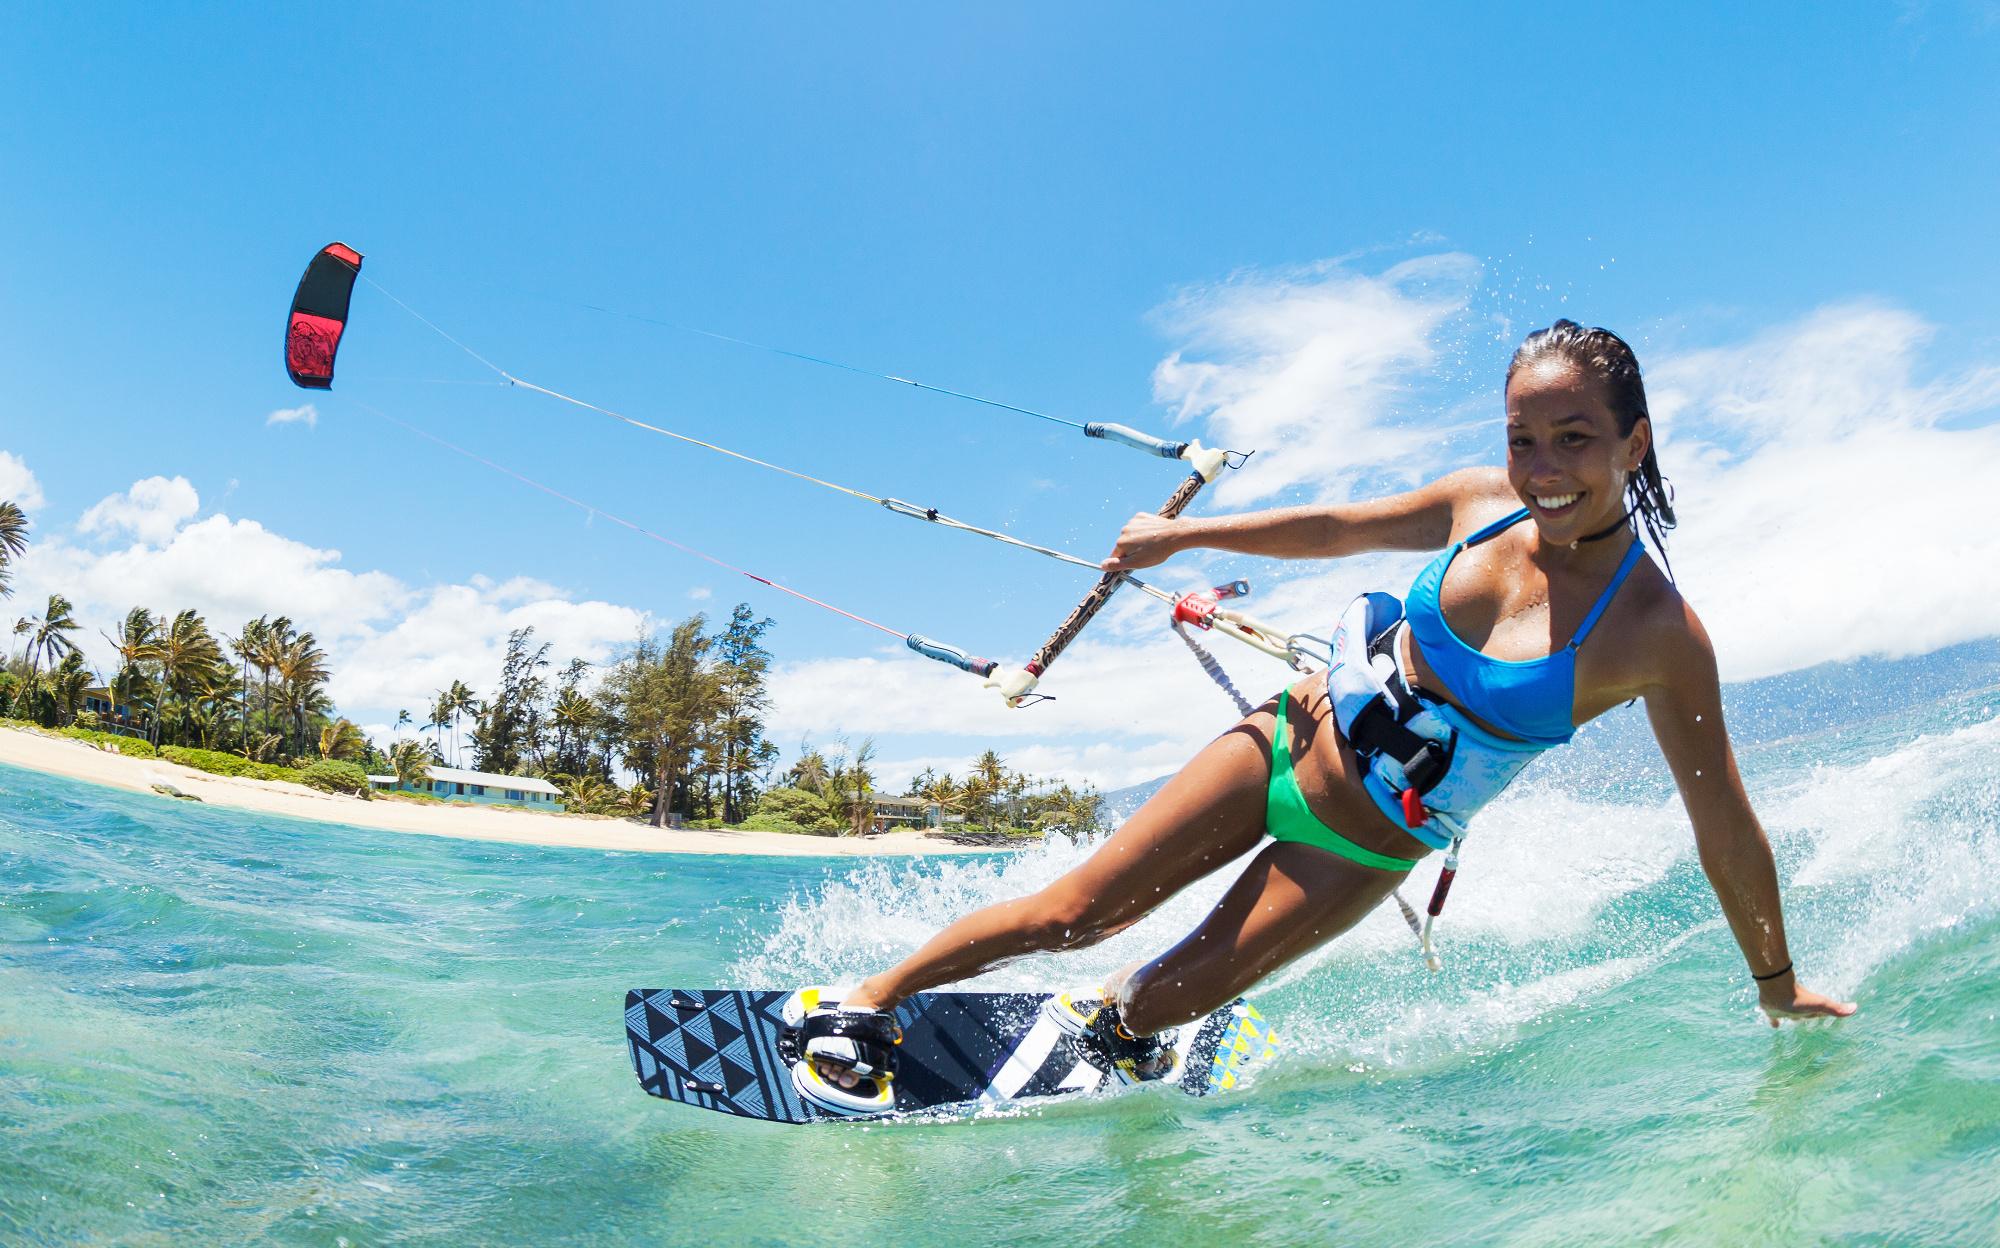 femme kitesurf adrénaline